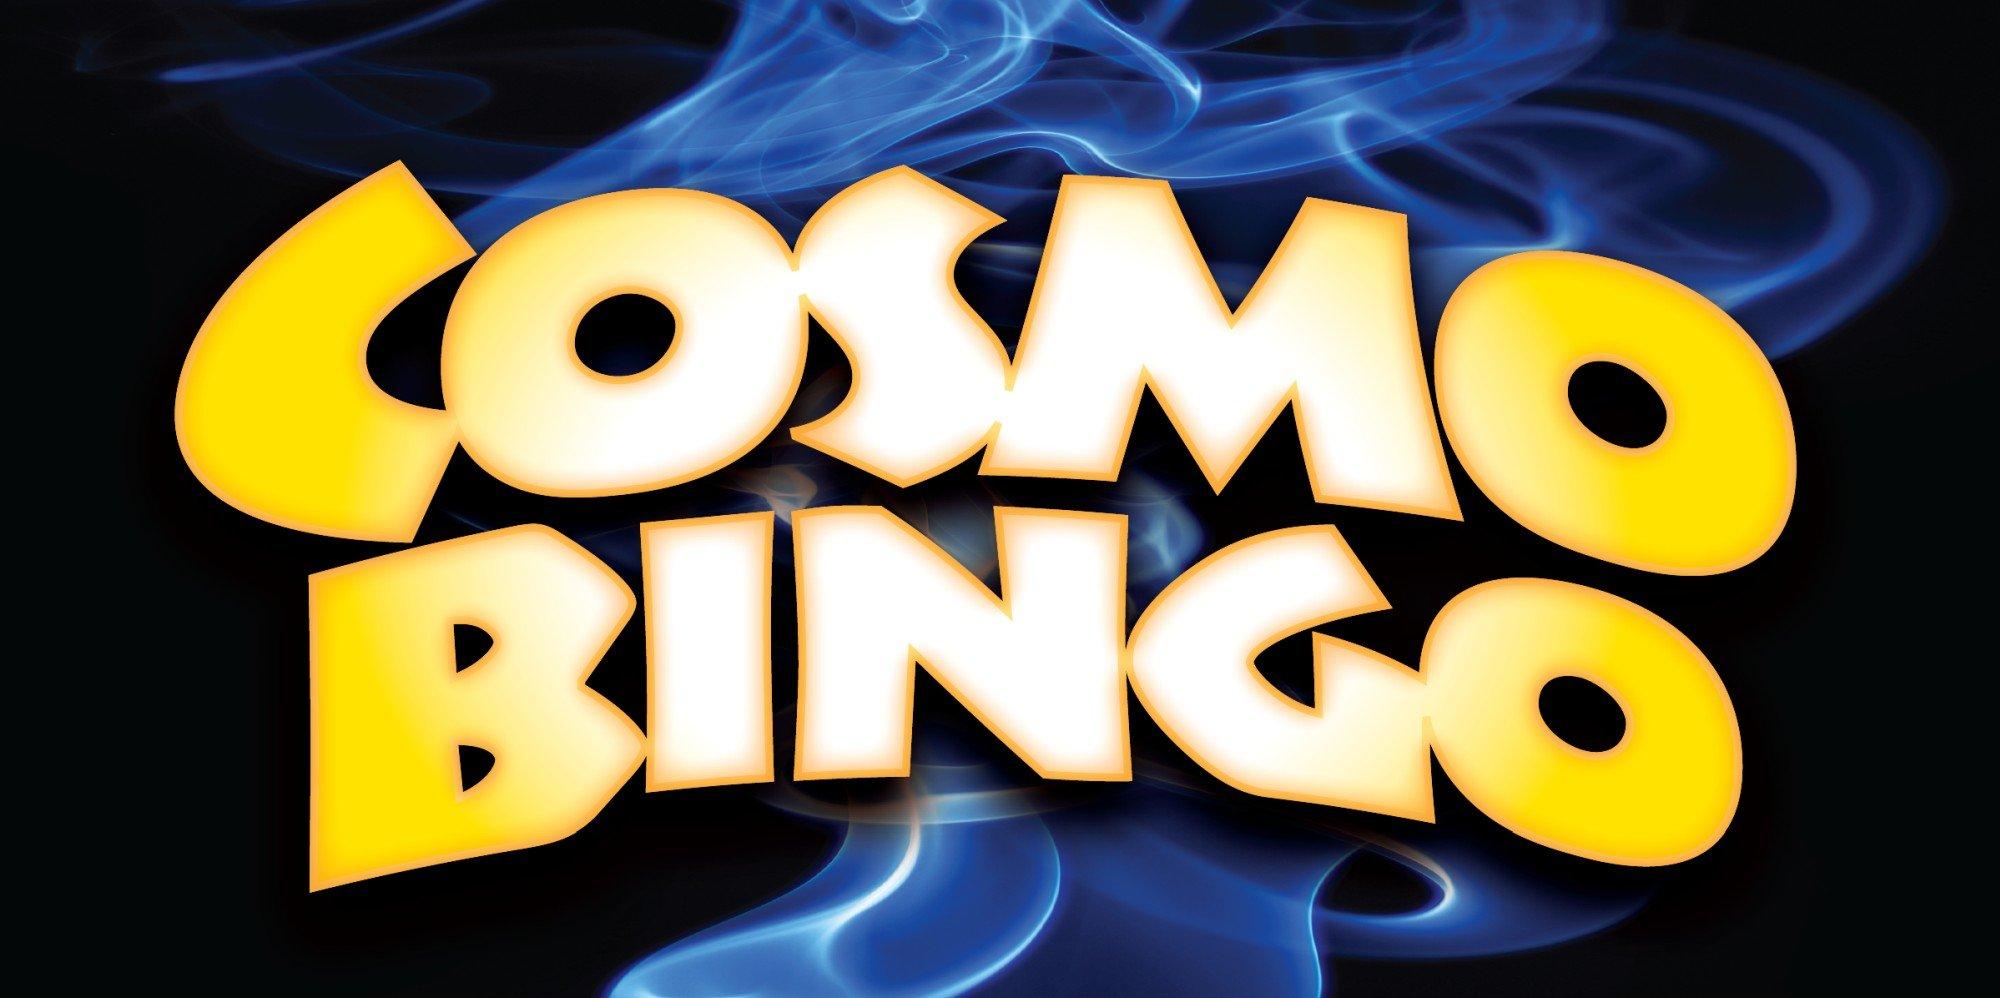 Web Header Promotion-August Cosmo Bingo